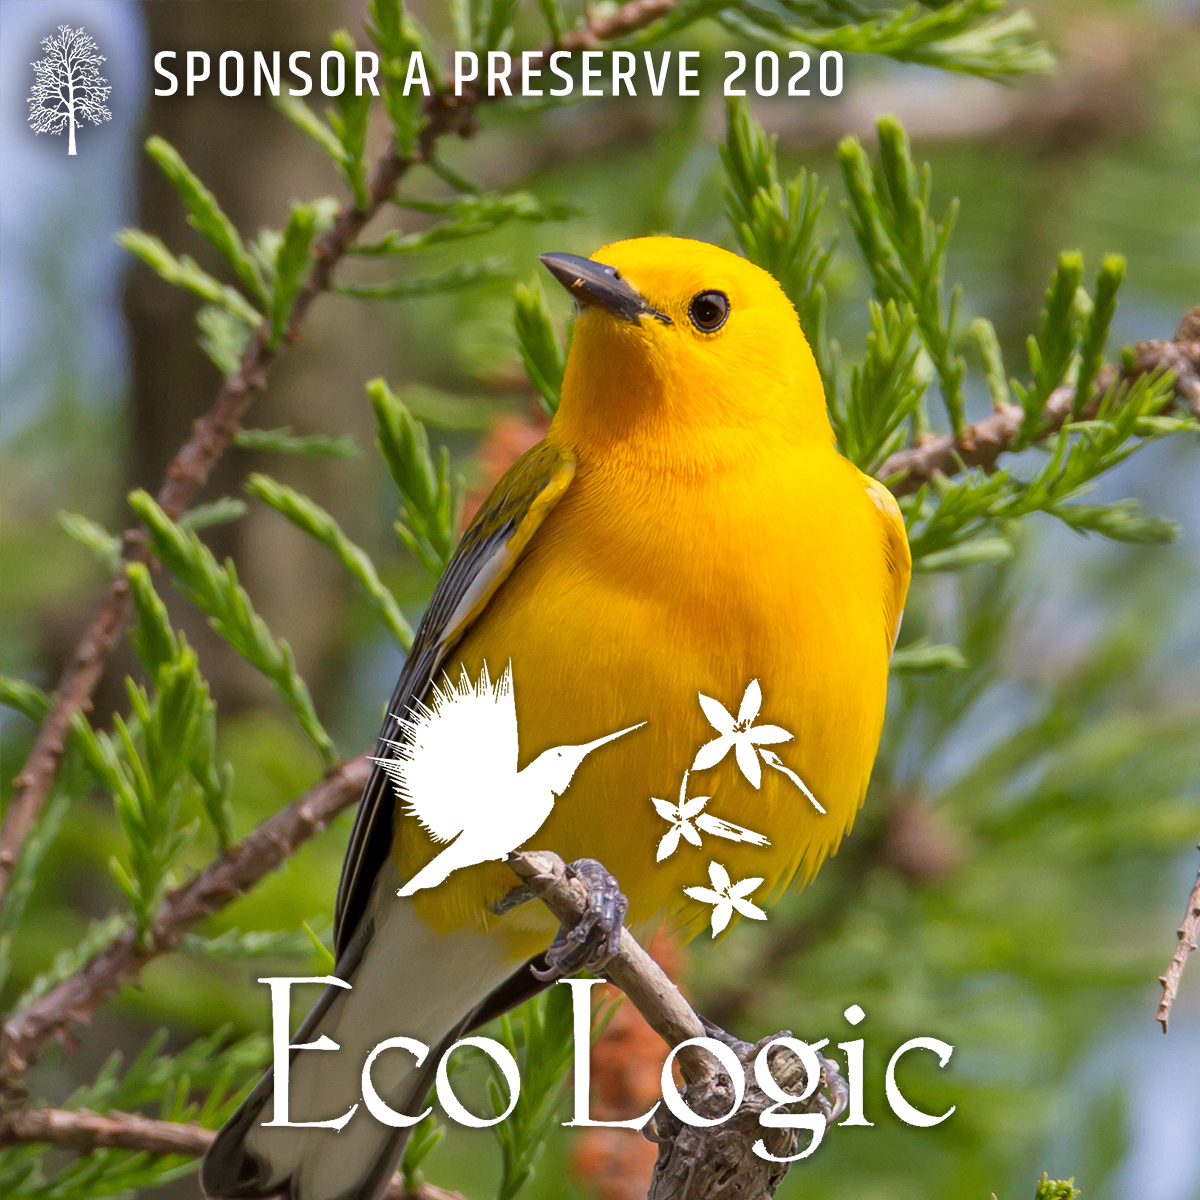 eco logic graphic